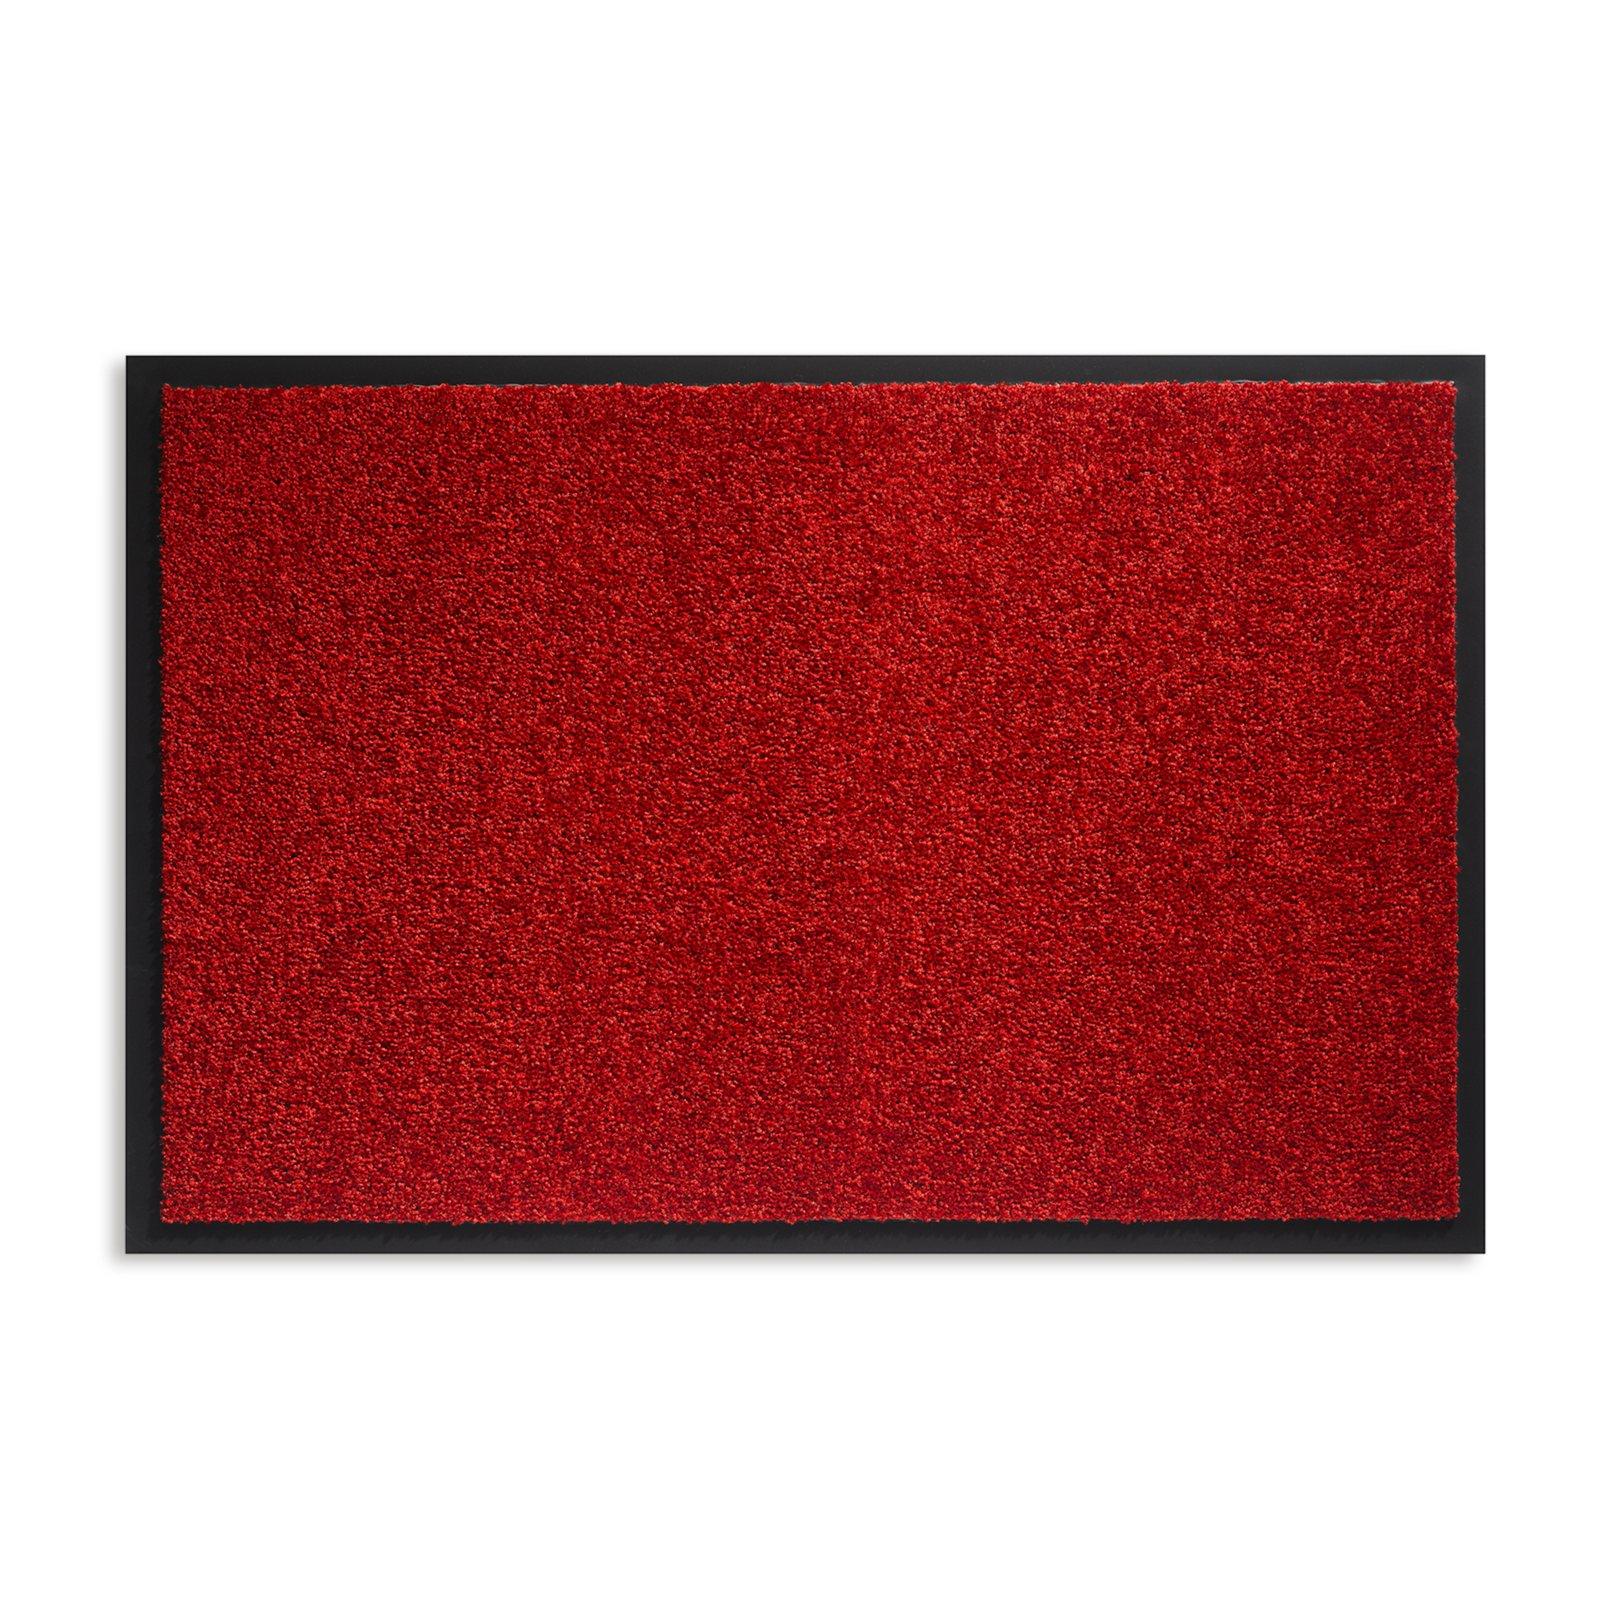 Fußmatte TWISTER - rot - 90x60 cm